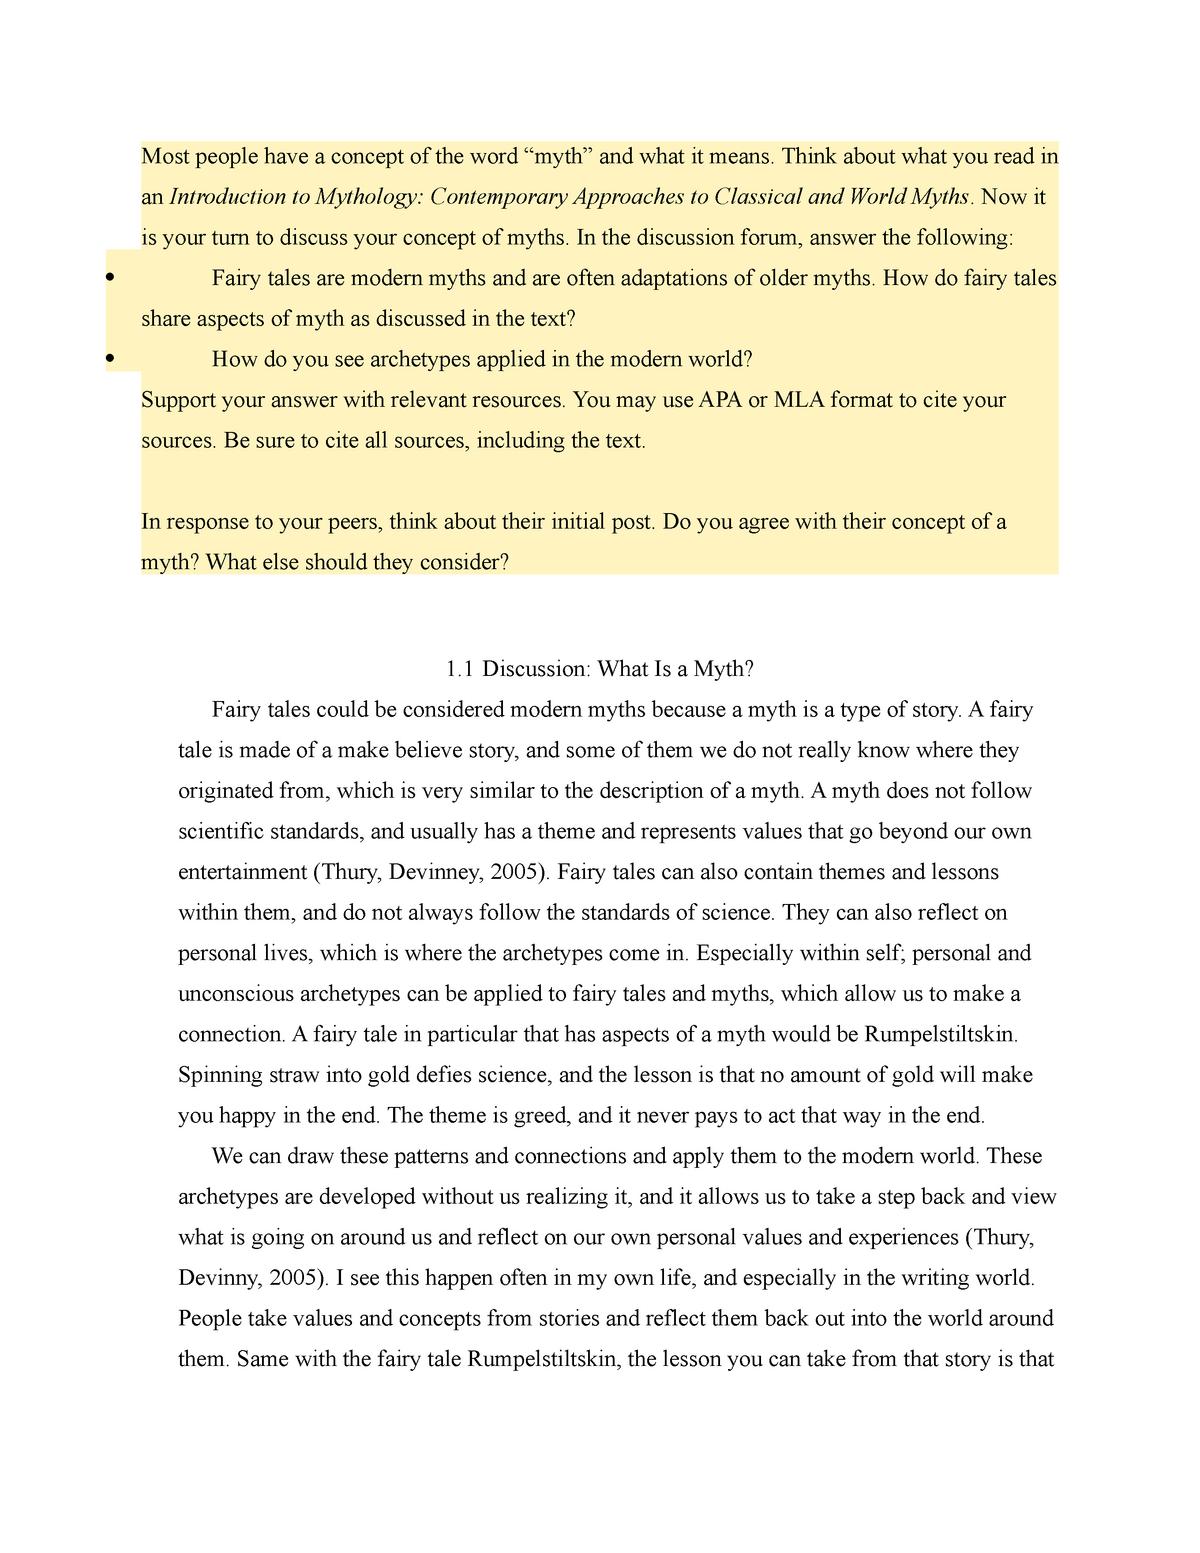 1-1 Discussion What Is a Myth - LIT229: World Mythology - StuDocu